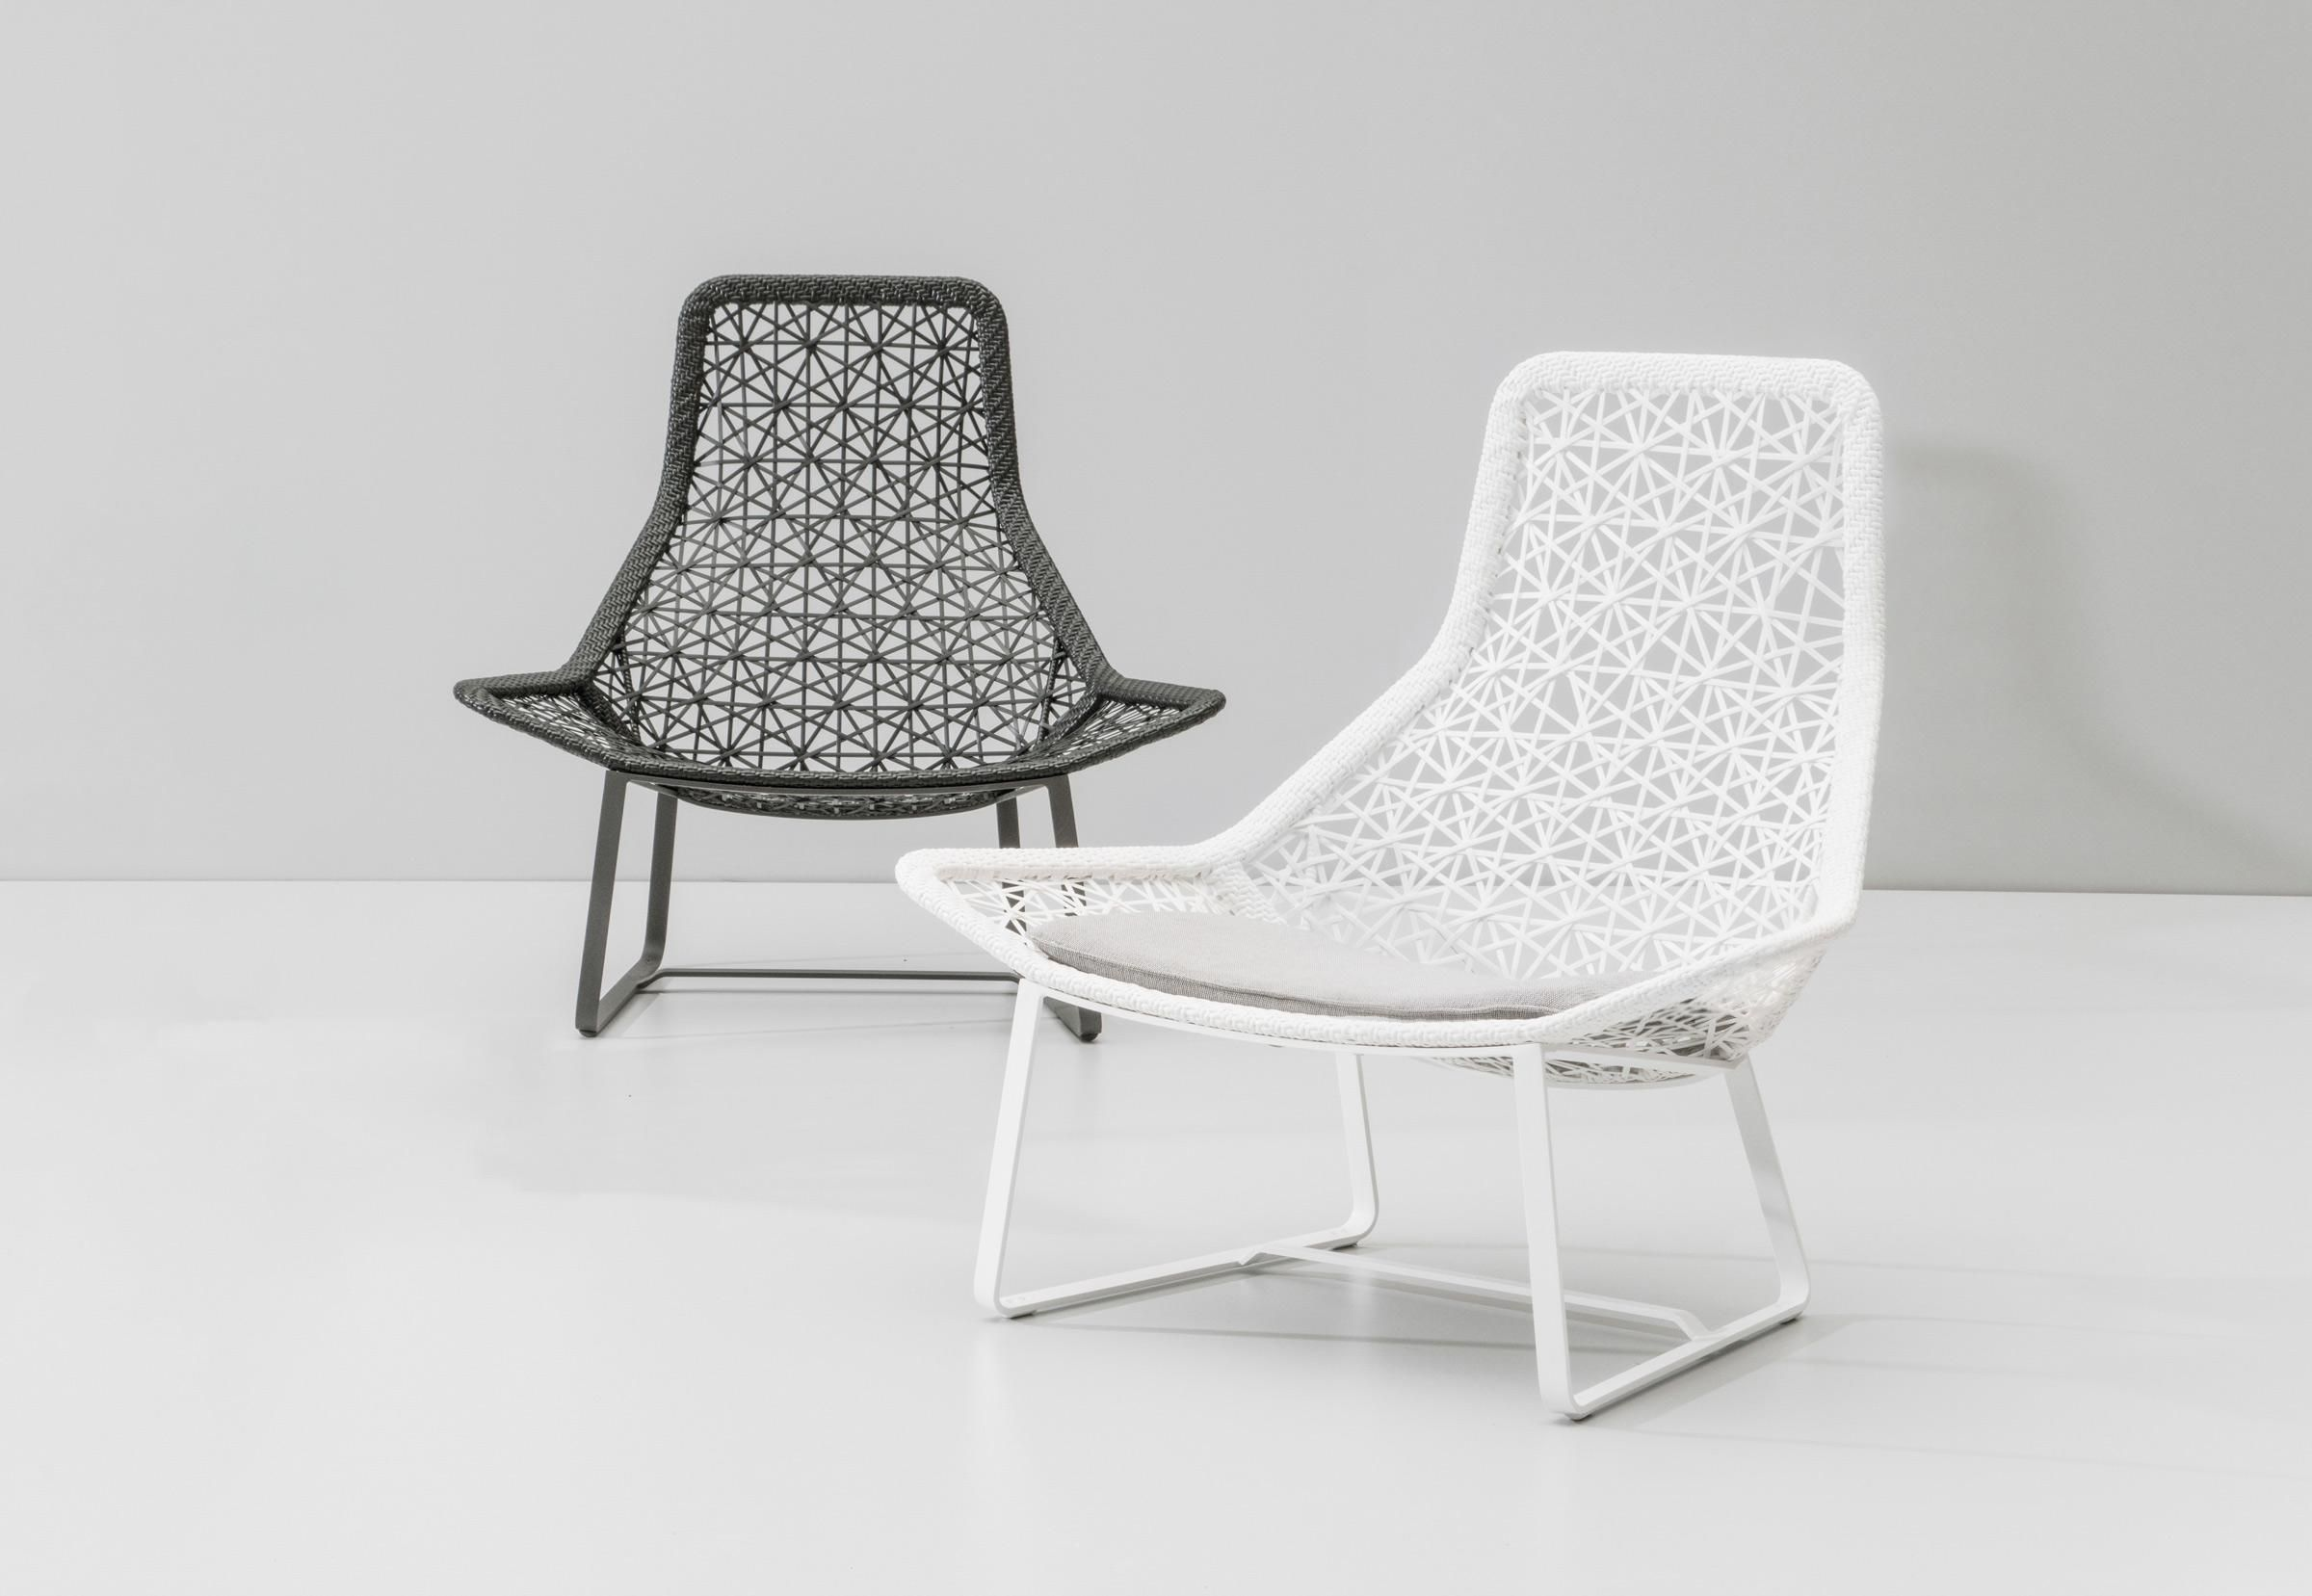 kettal   maia   relax armchair   outdoor lounge sessel   pinterest, Möbel